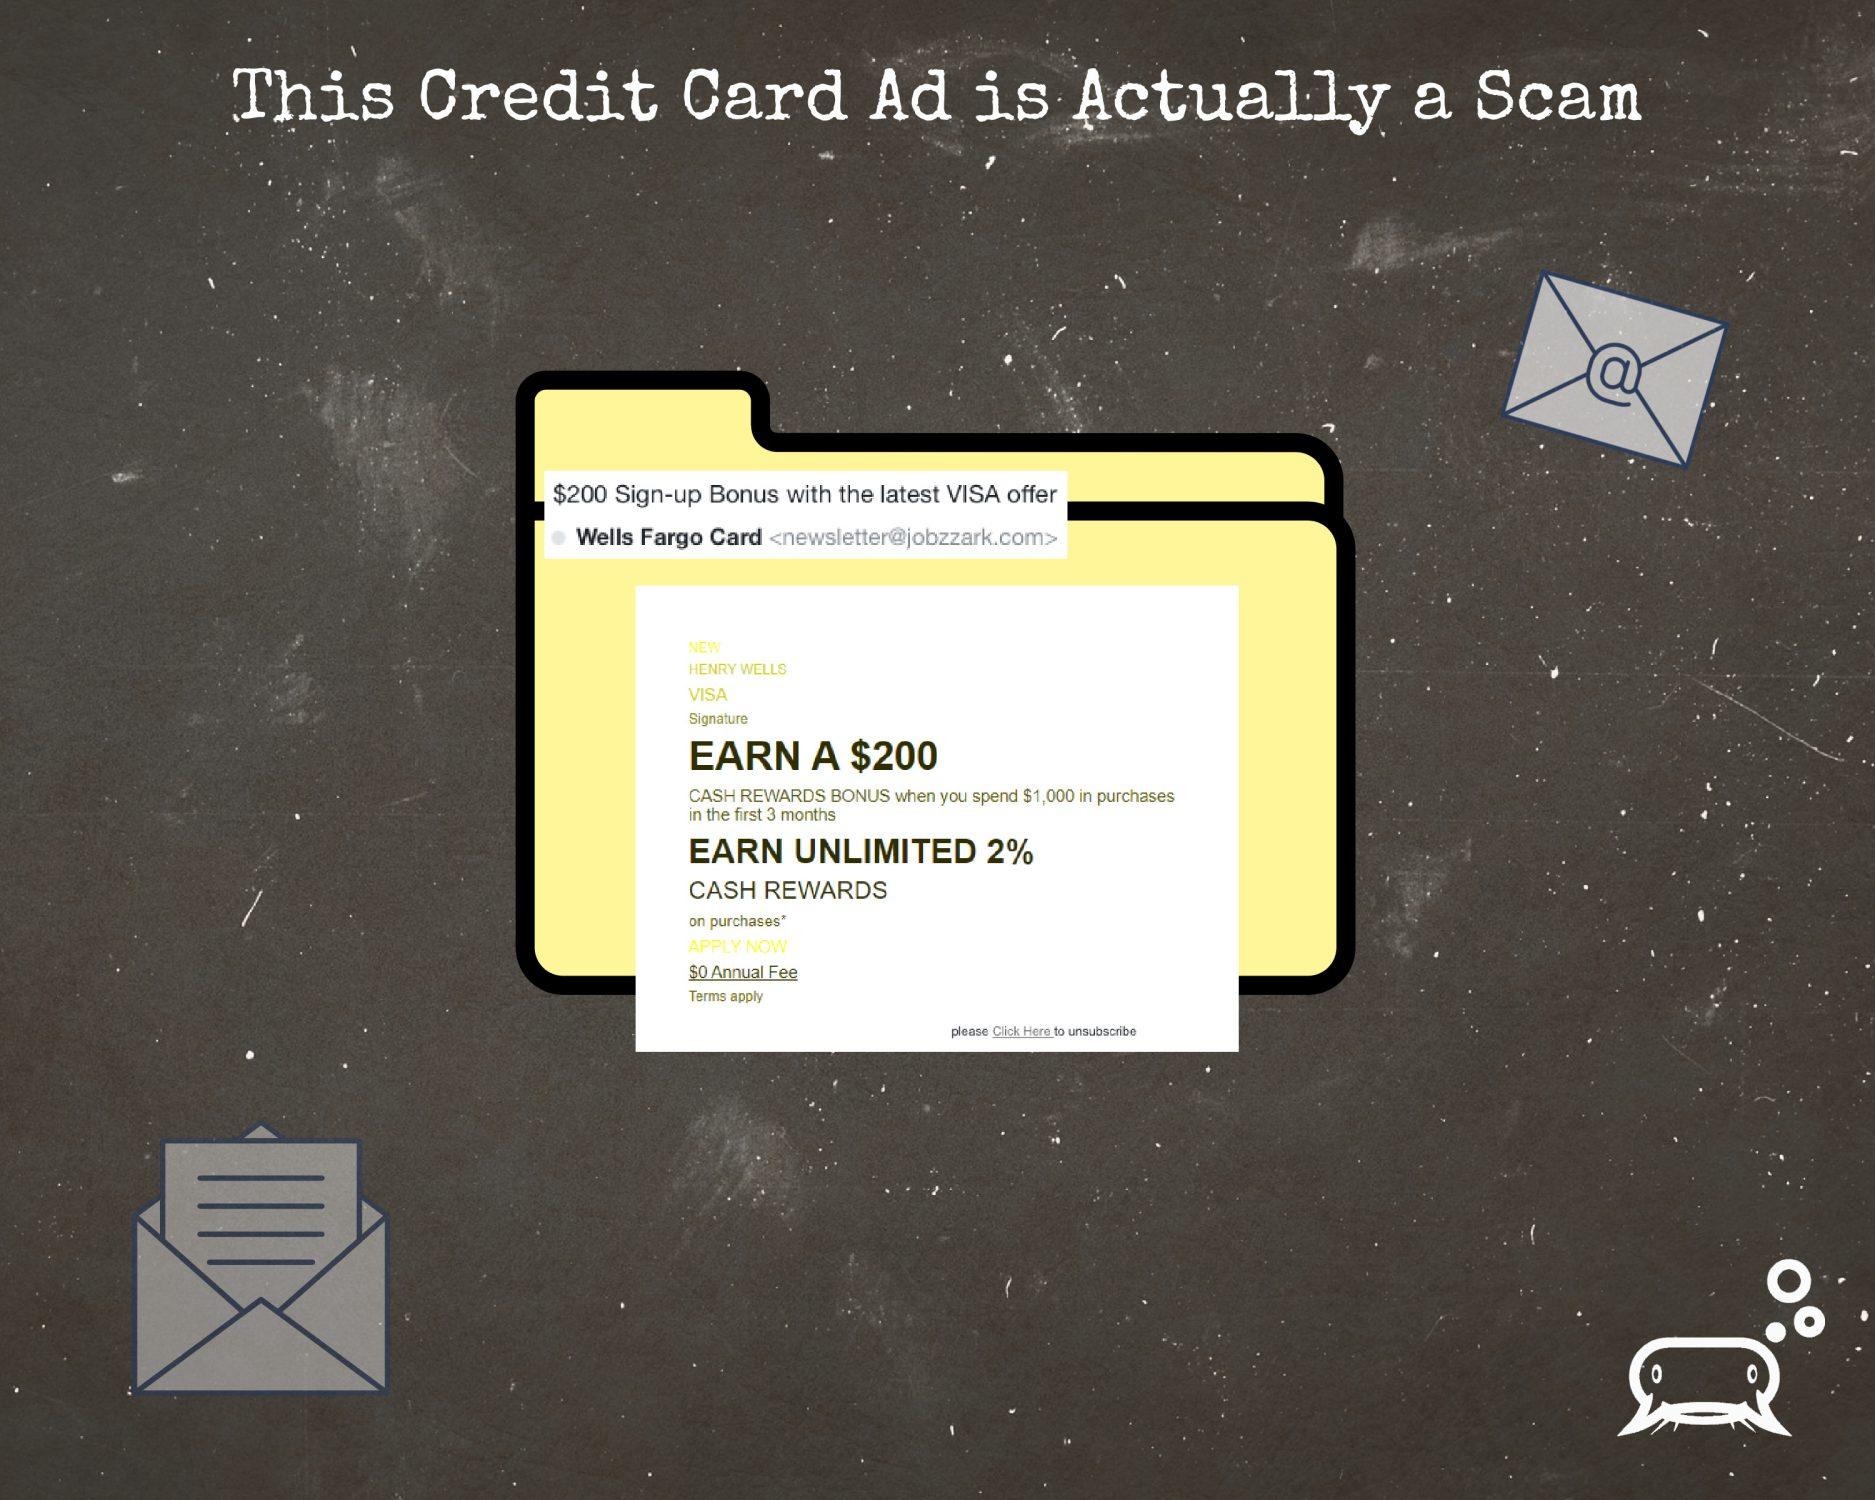 Credit-Card-Ad-Scam